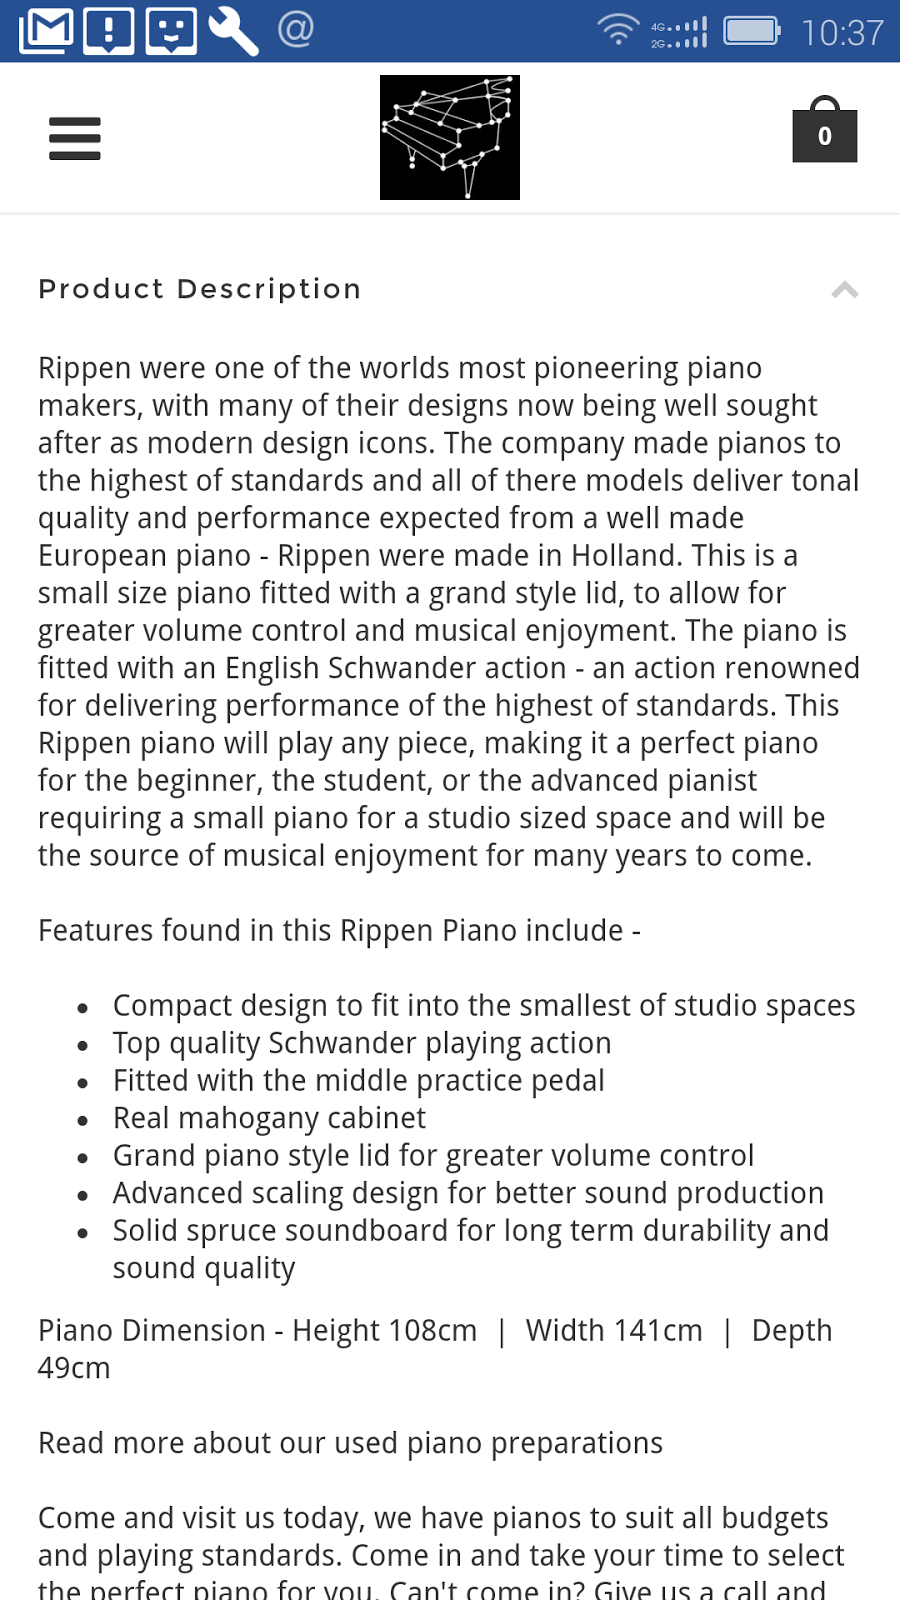 Jual Piano Bekas Kondisi Prima Sold Out RIPPEN 114cm